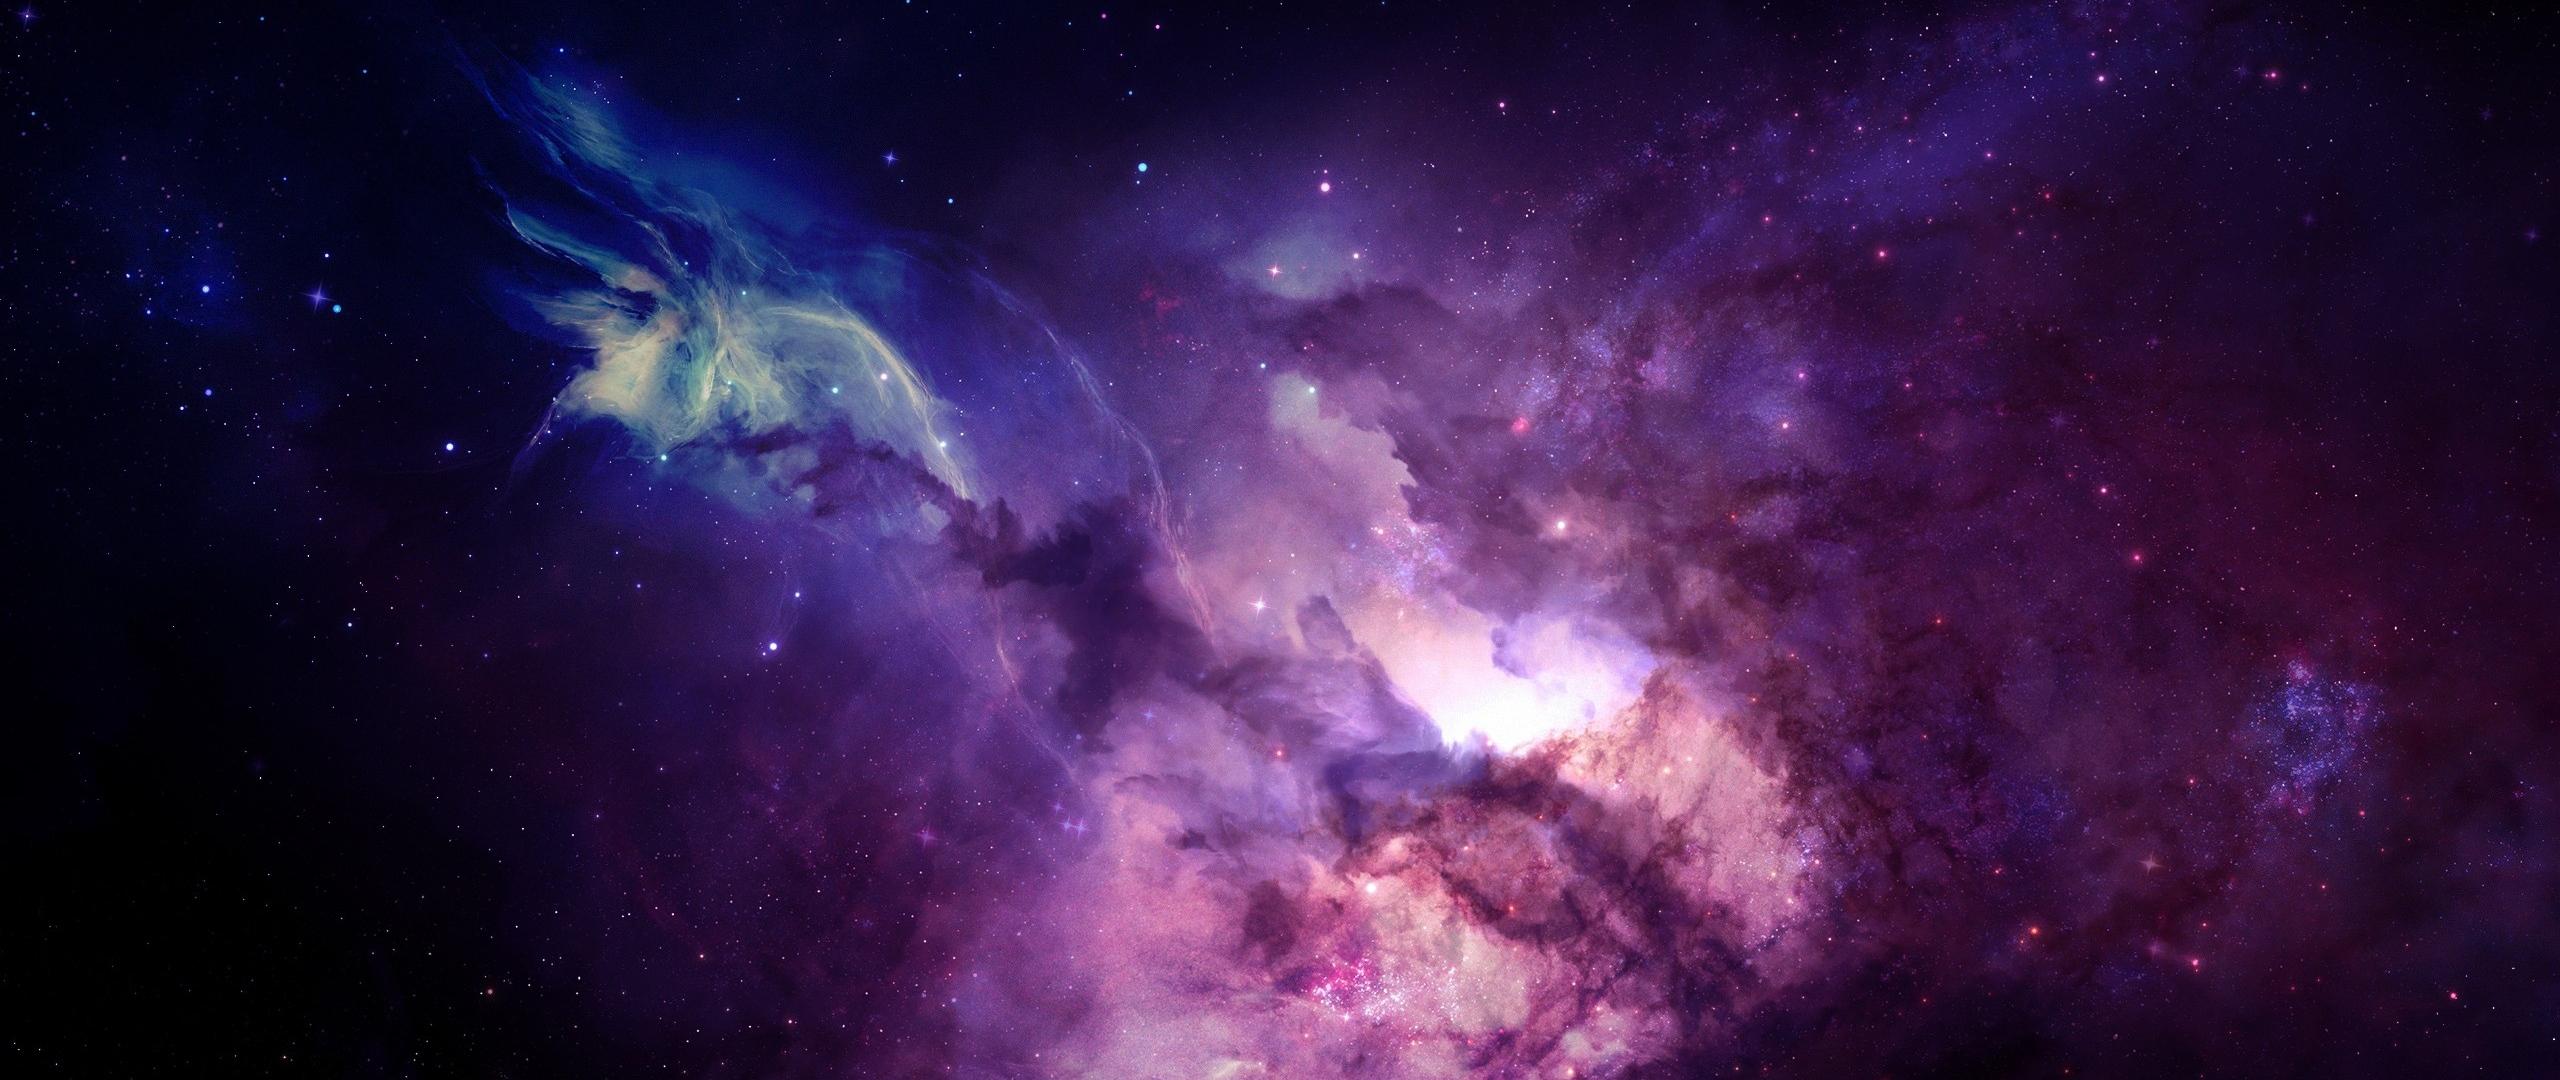 Download Wallpaper 2560x1080 space flight sky shadow 2560x1080 219 2560x1080